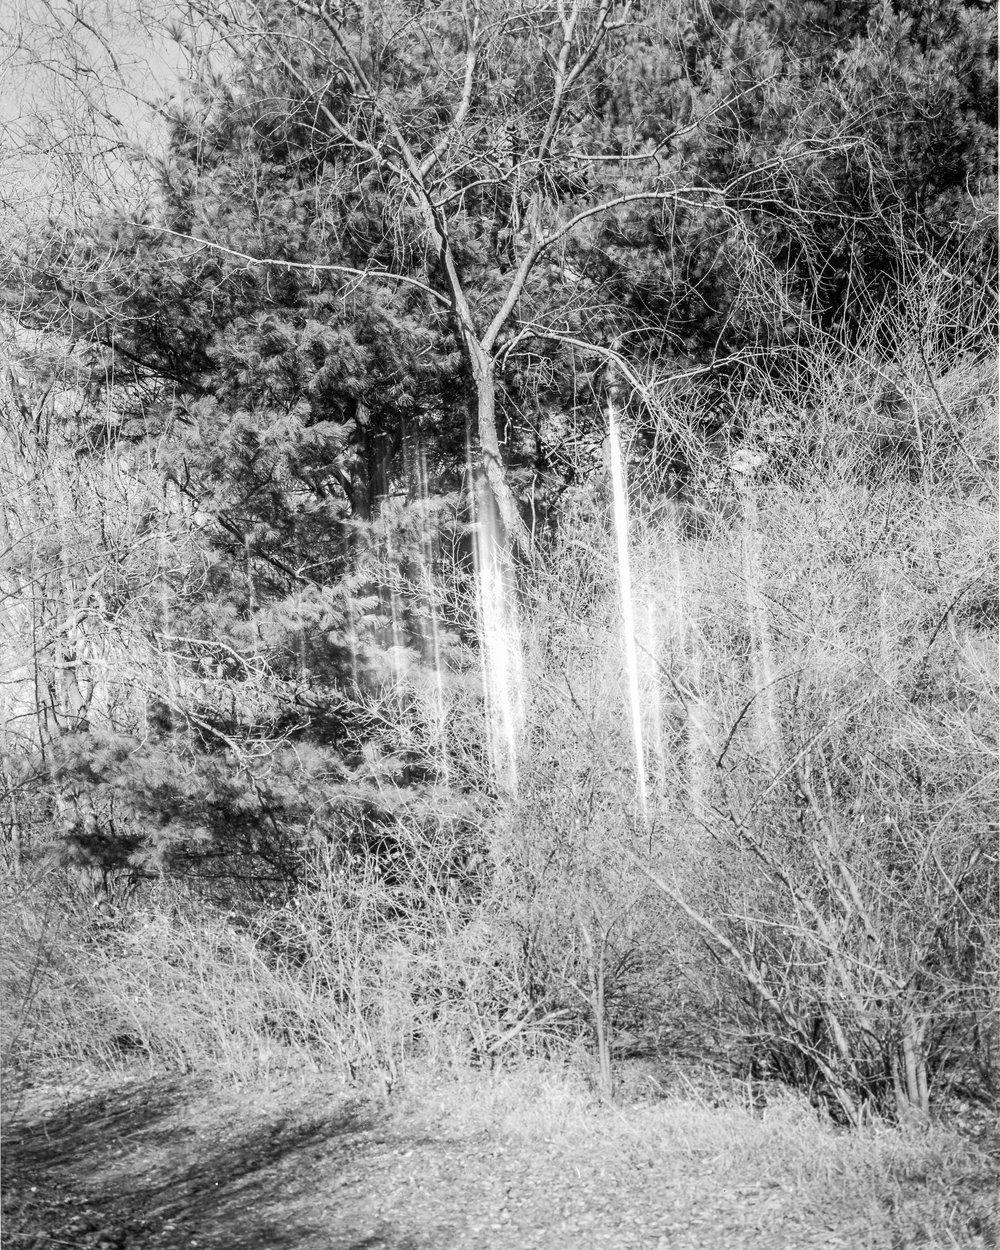 4x5-3.jpg